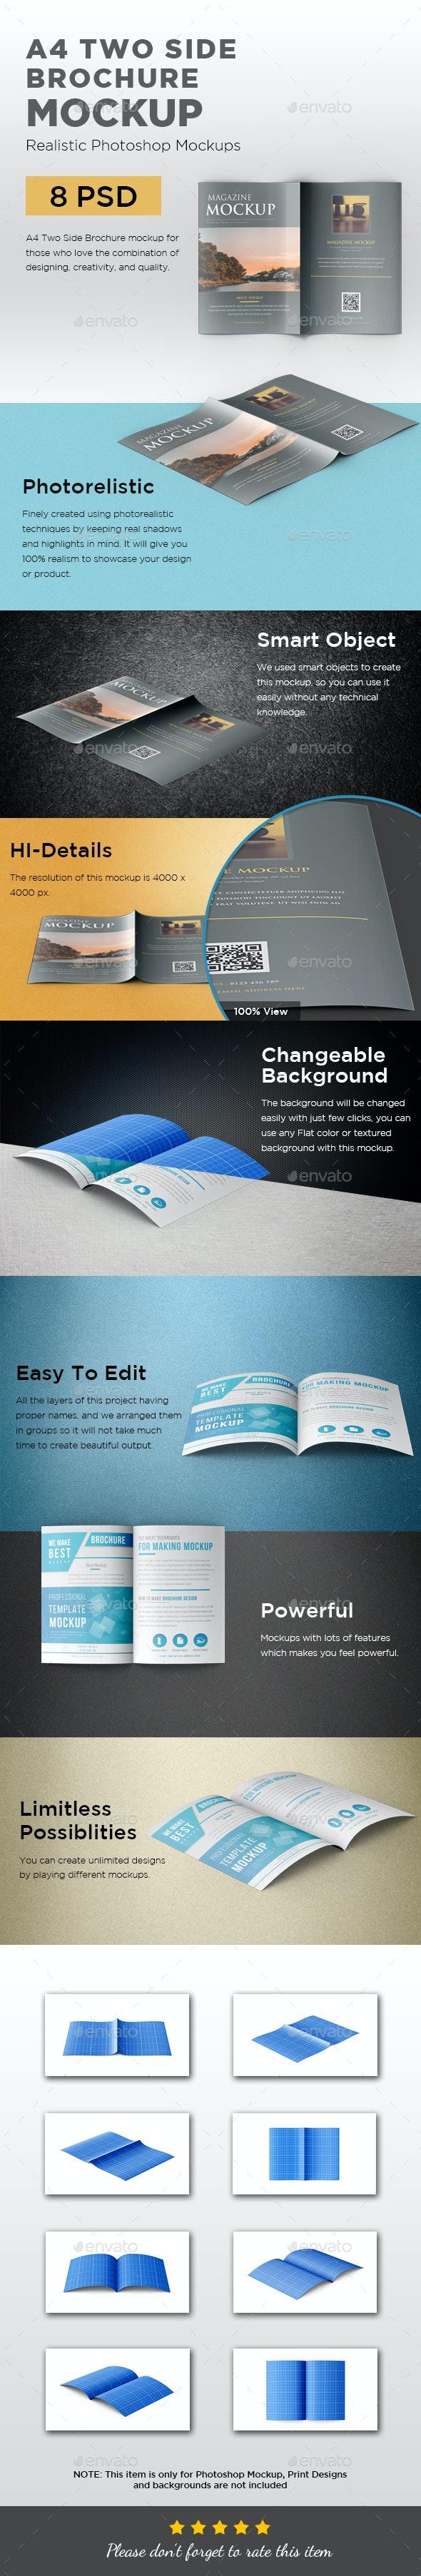 A4 Two Side Folded Brochure Mockup - Brochures Print